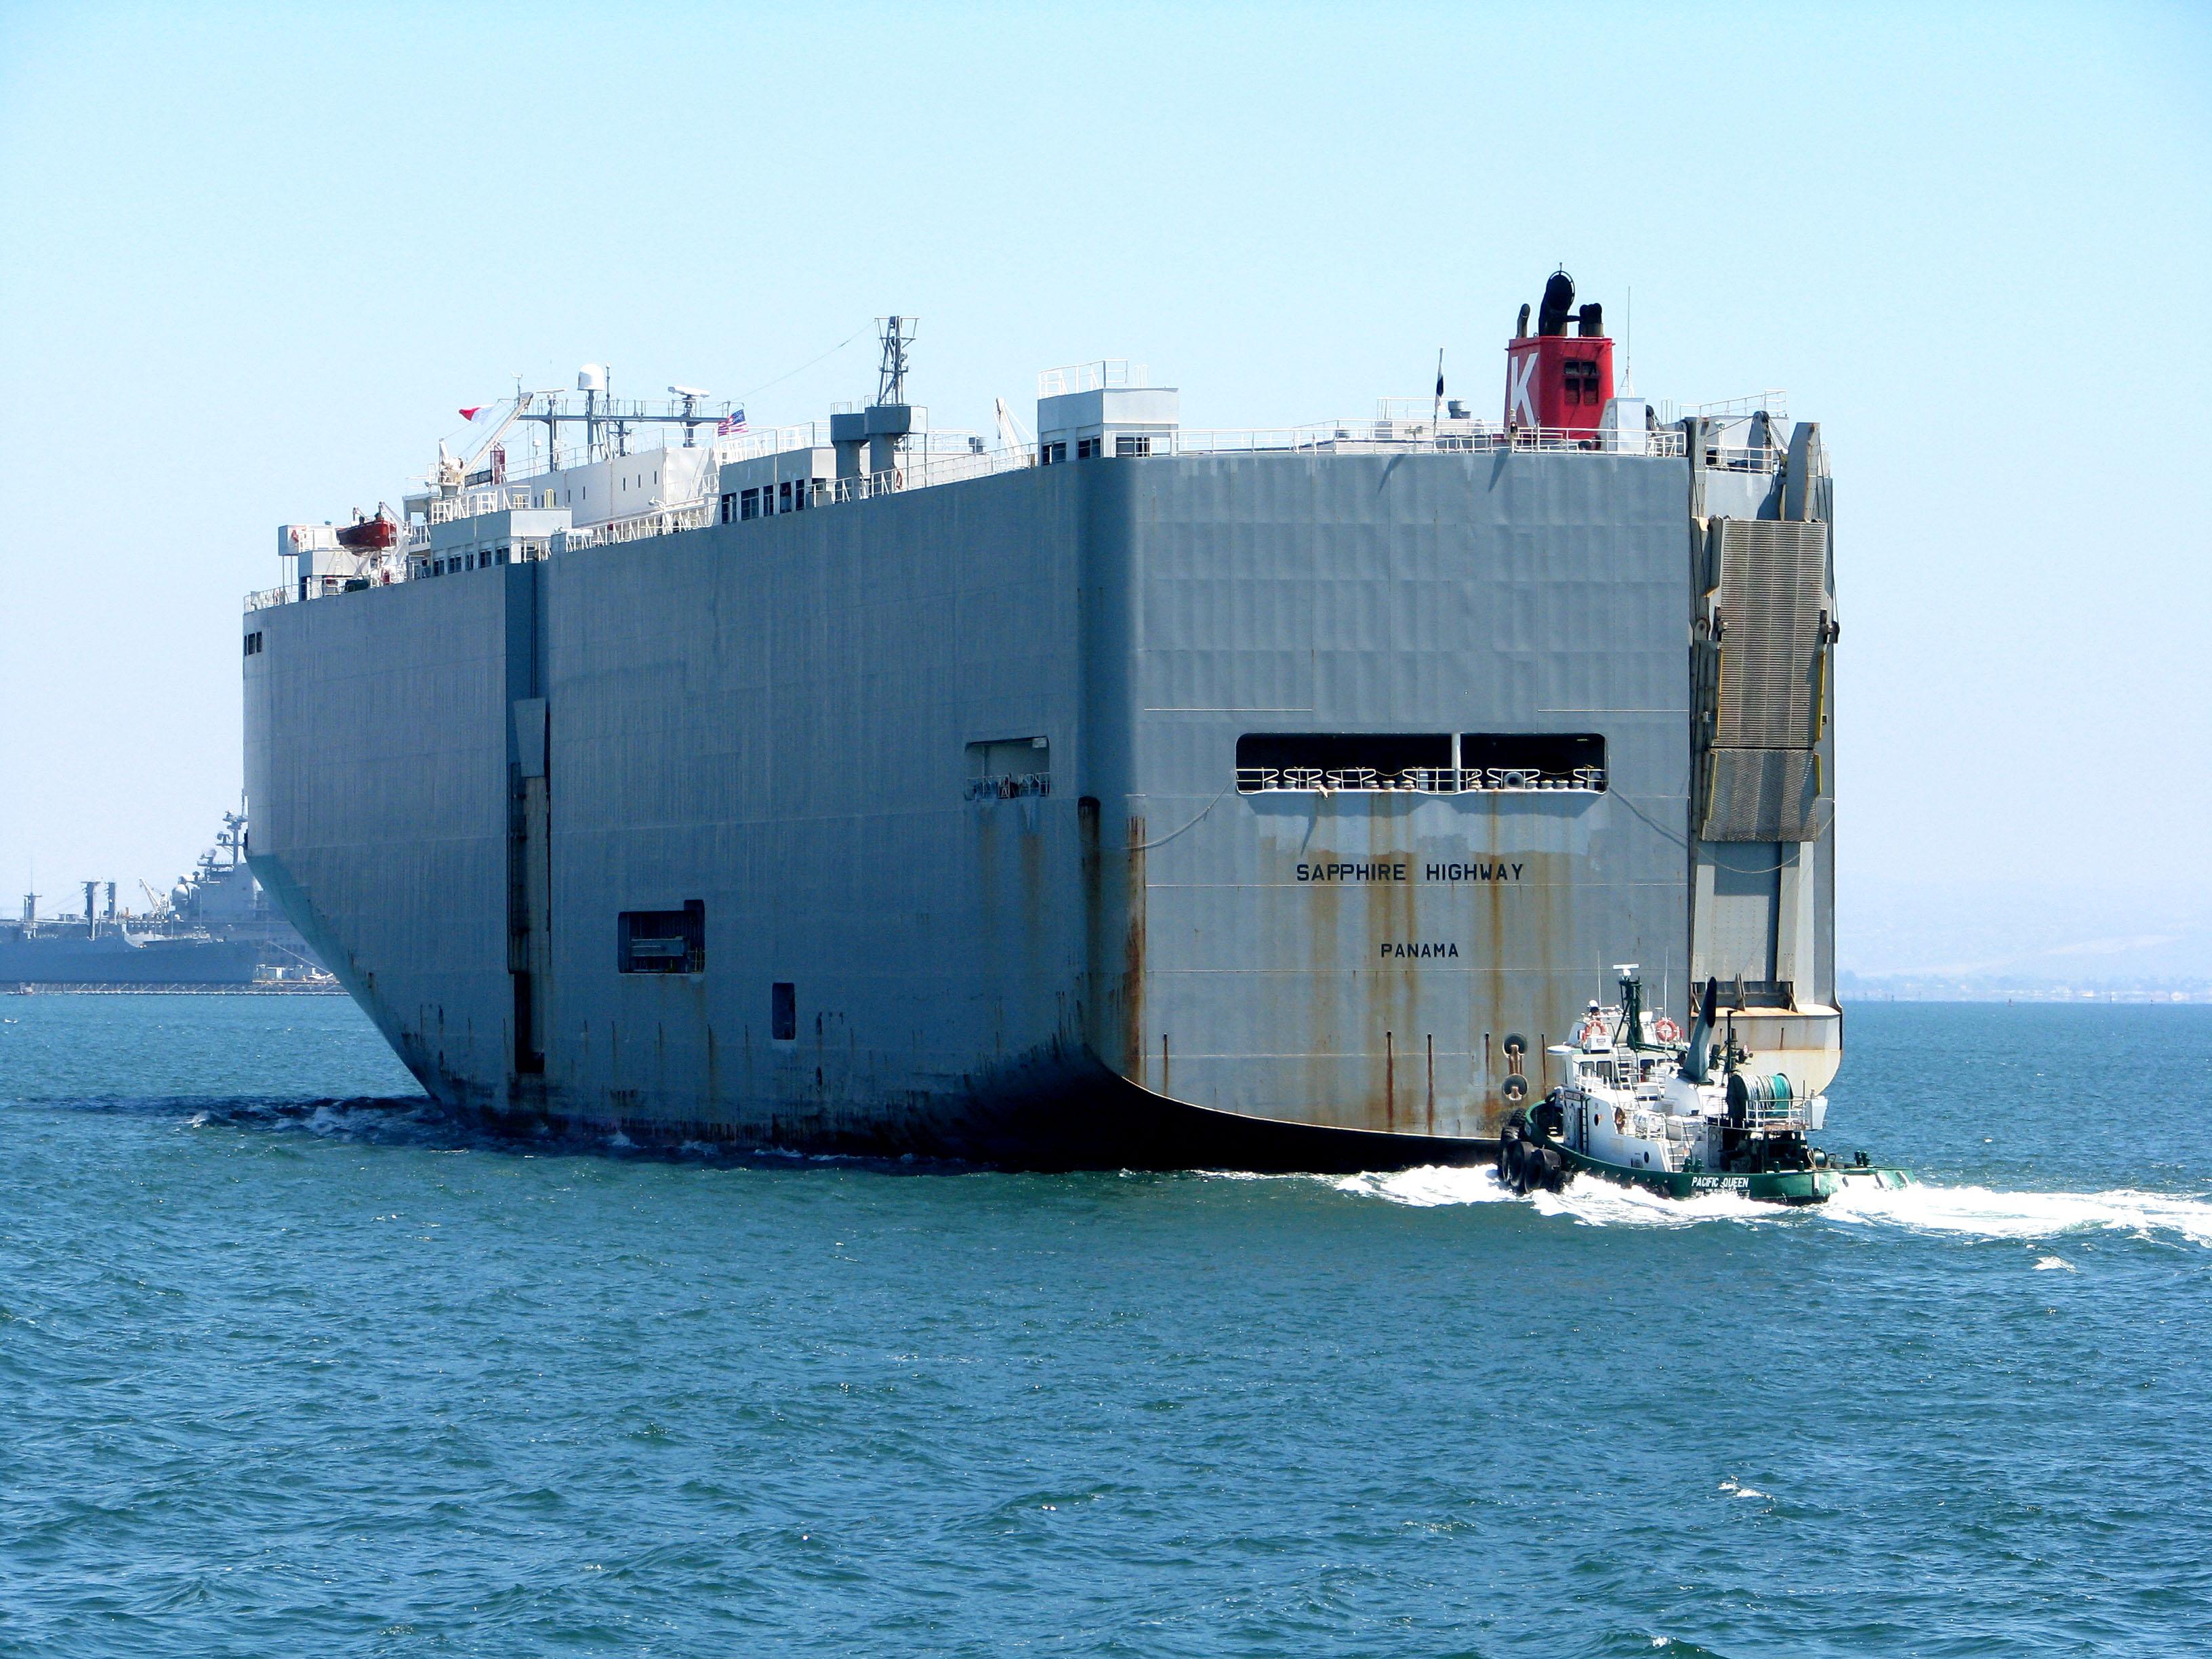 A huge ship